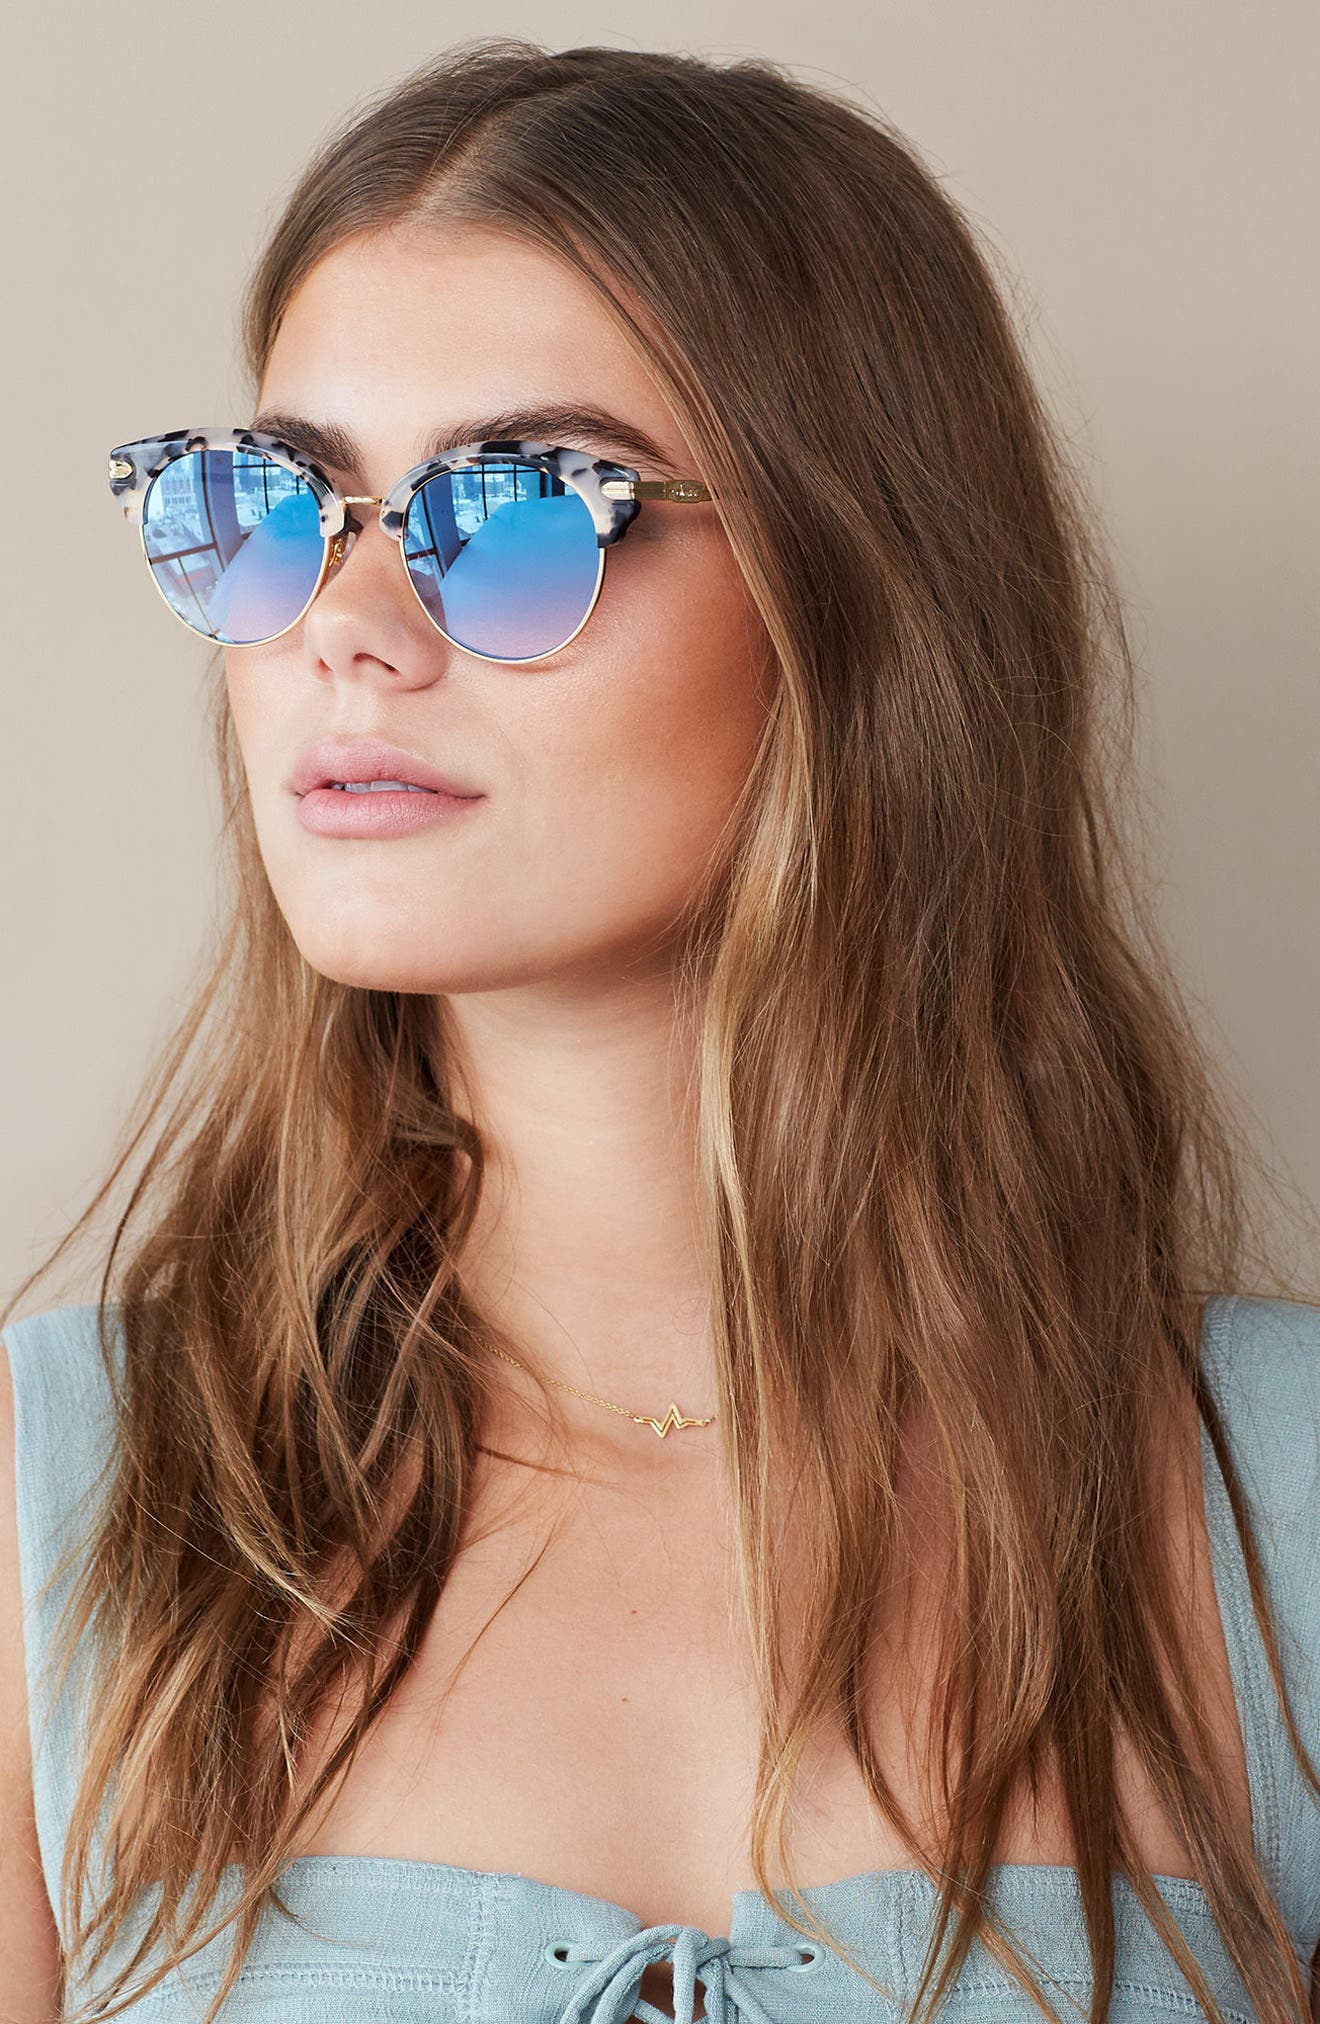 Bellevue 50mm Mirrored Sunglasses,                             Alternate thumbnail 4, color,                             200